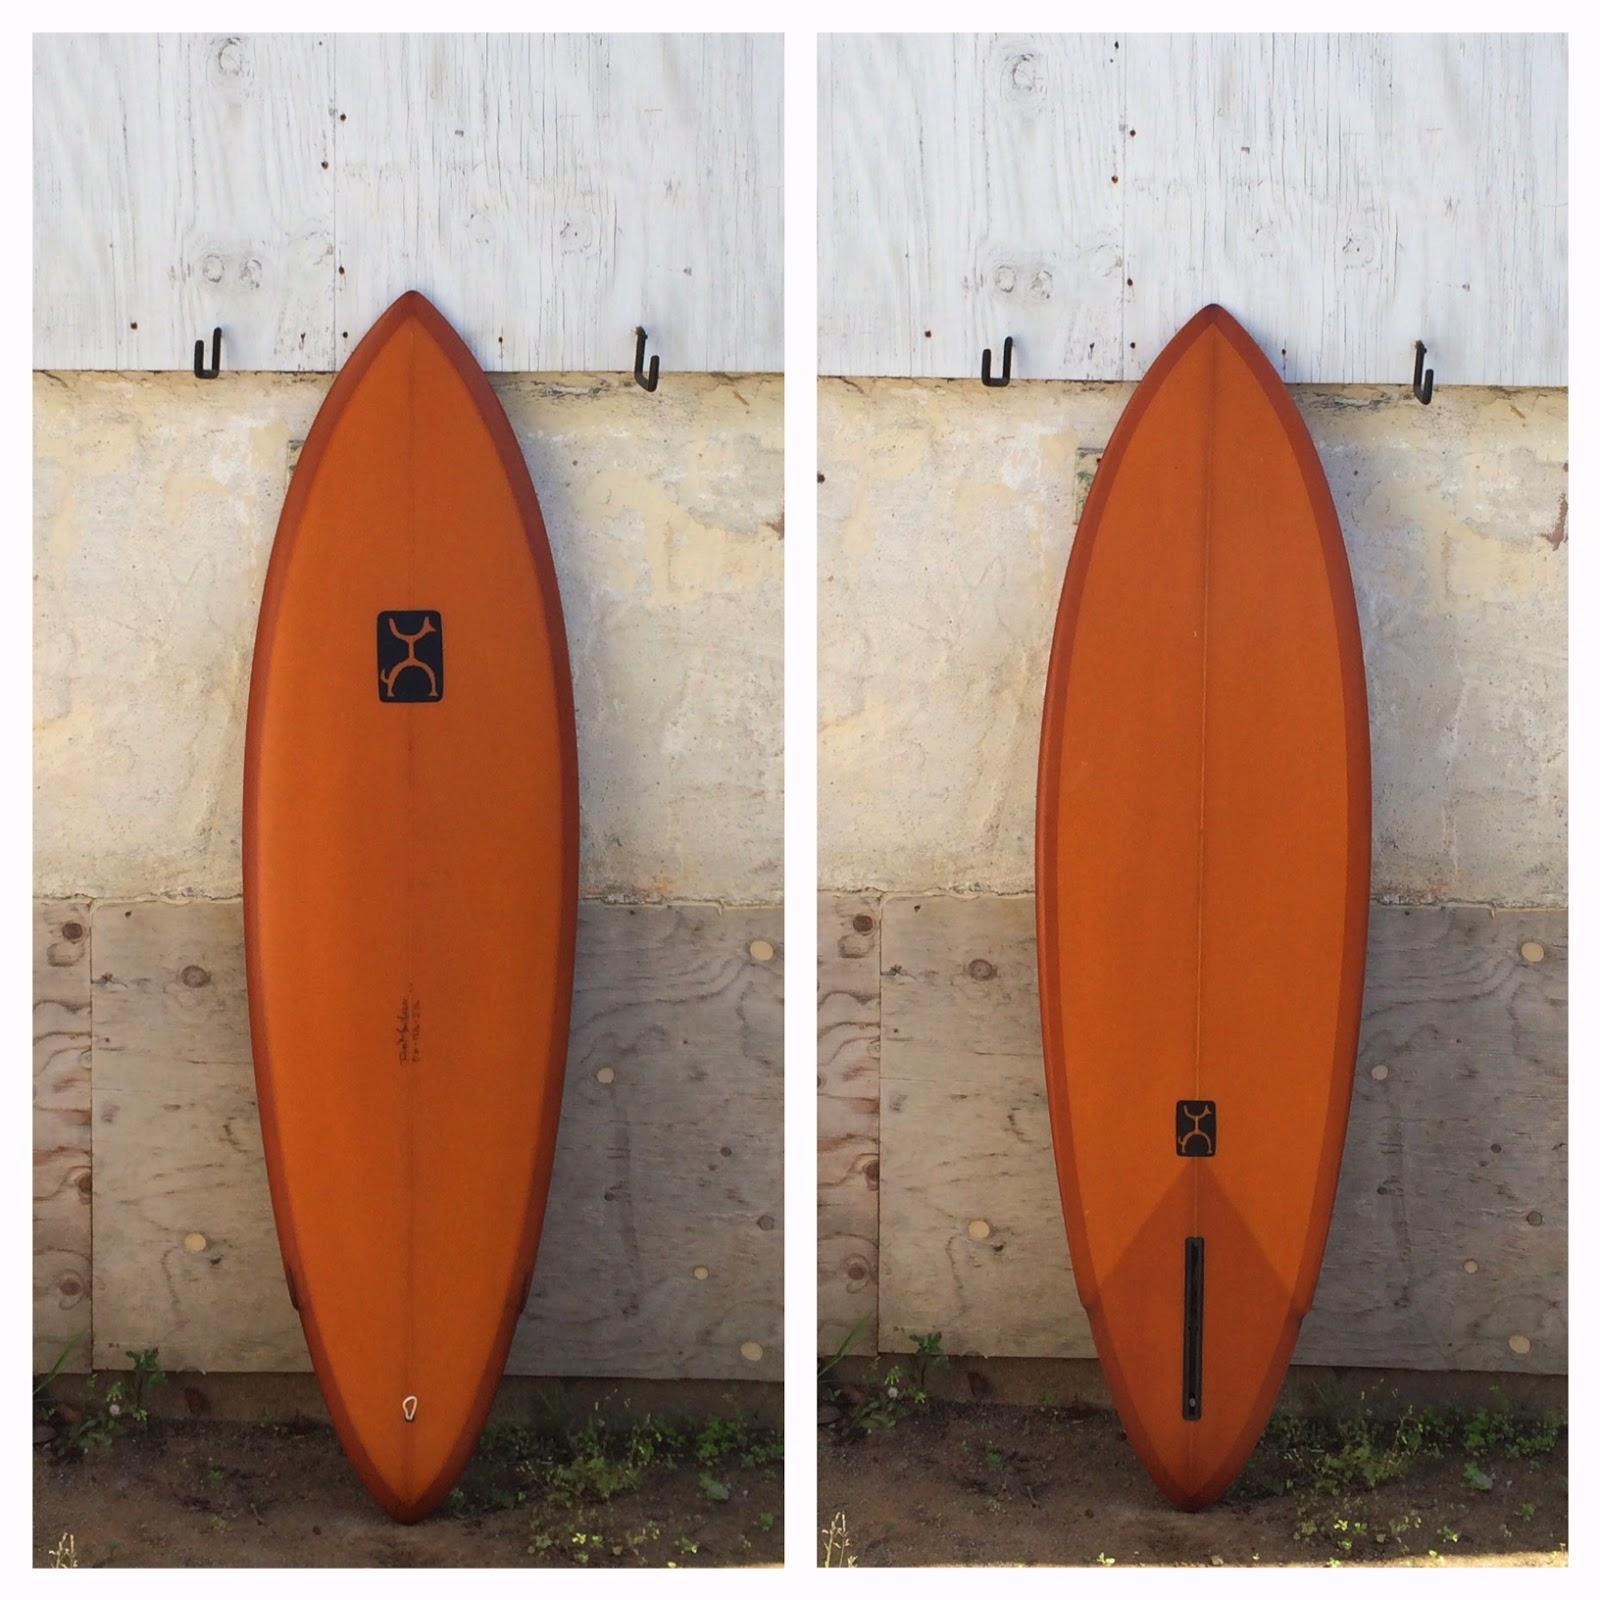 Rusty single fin